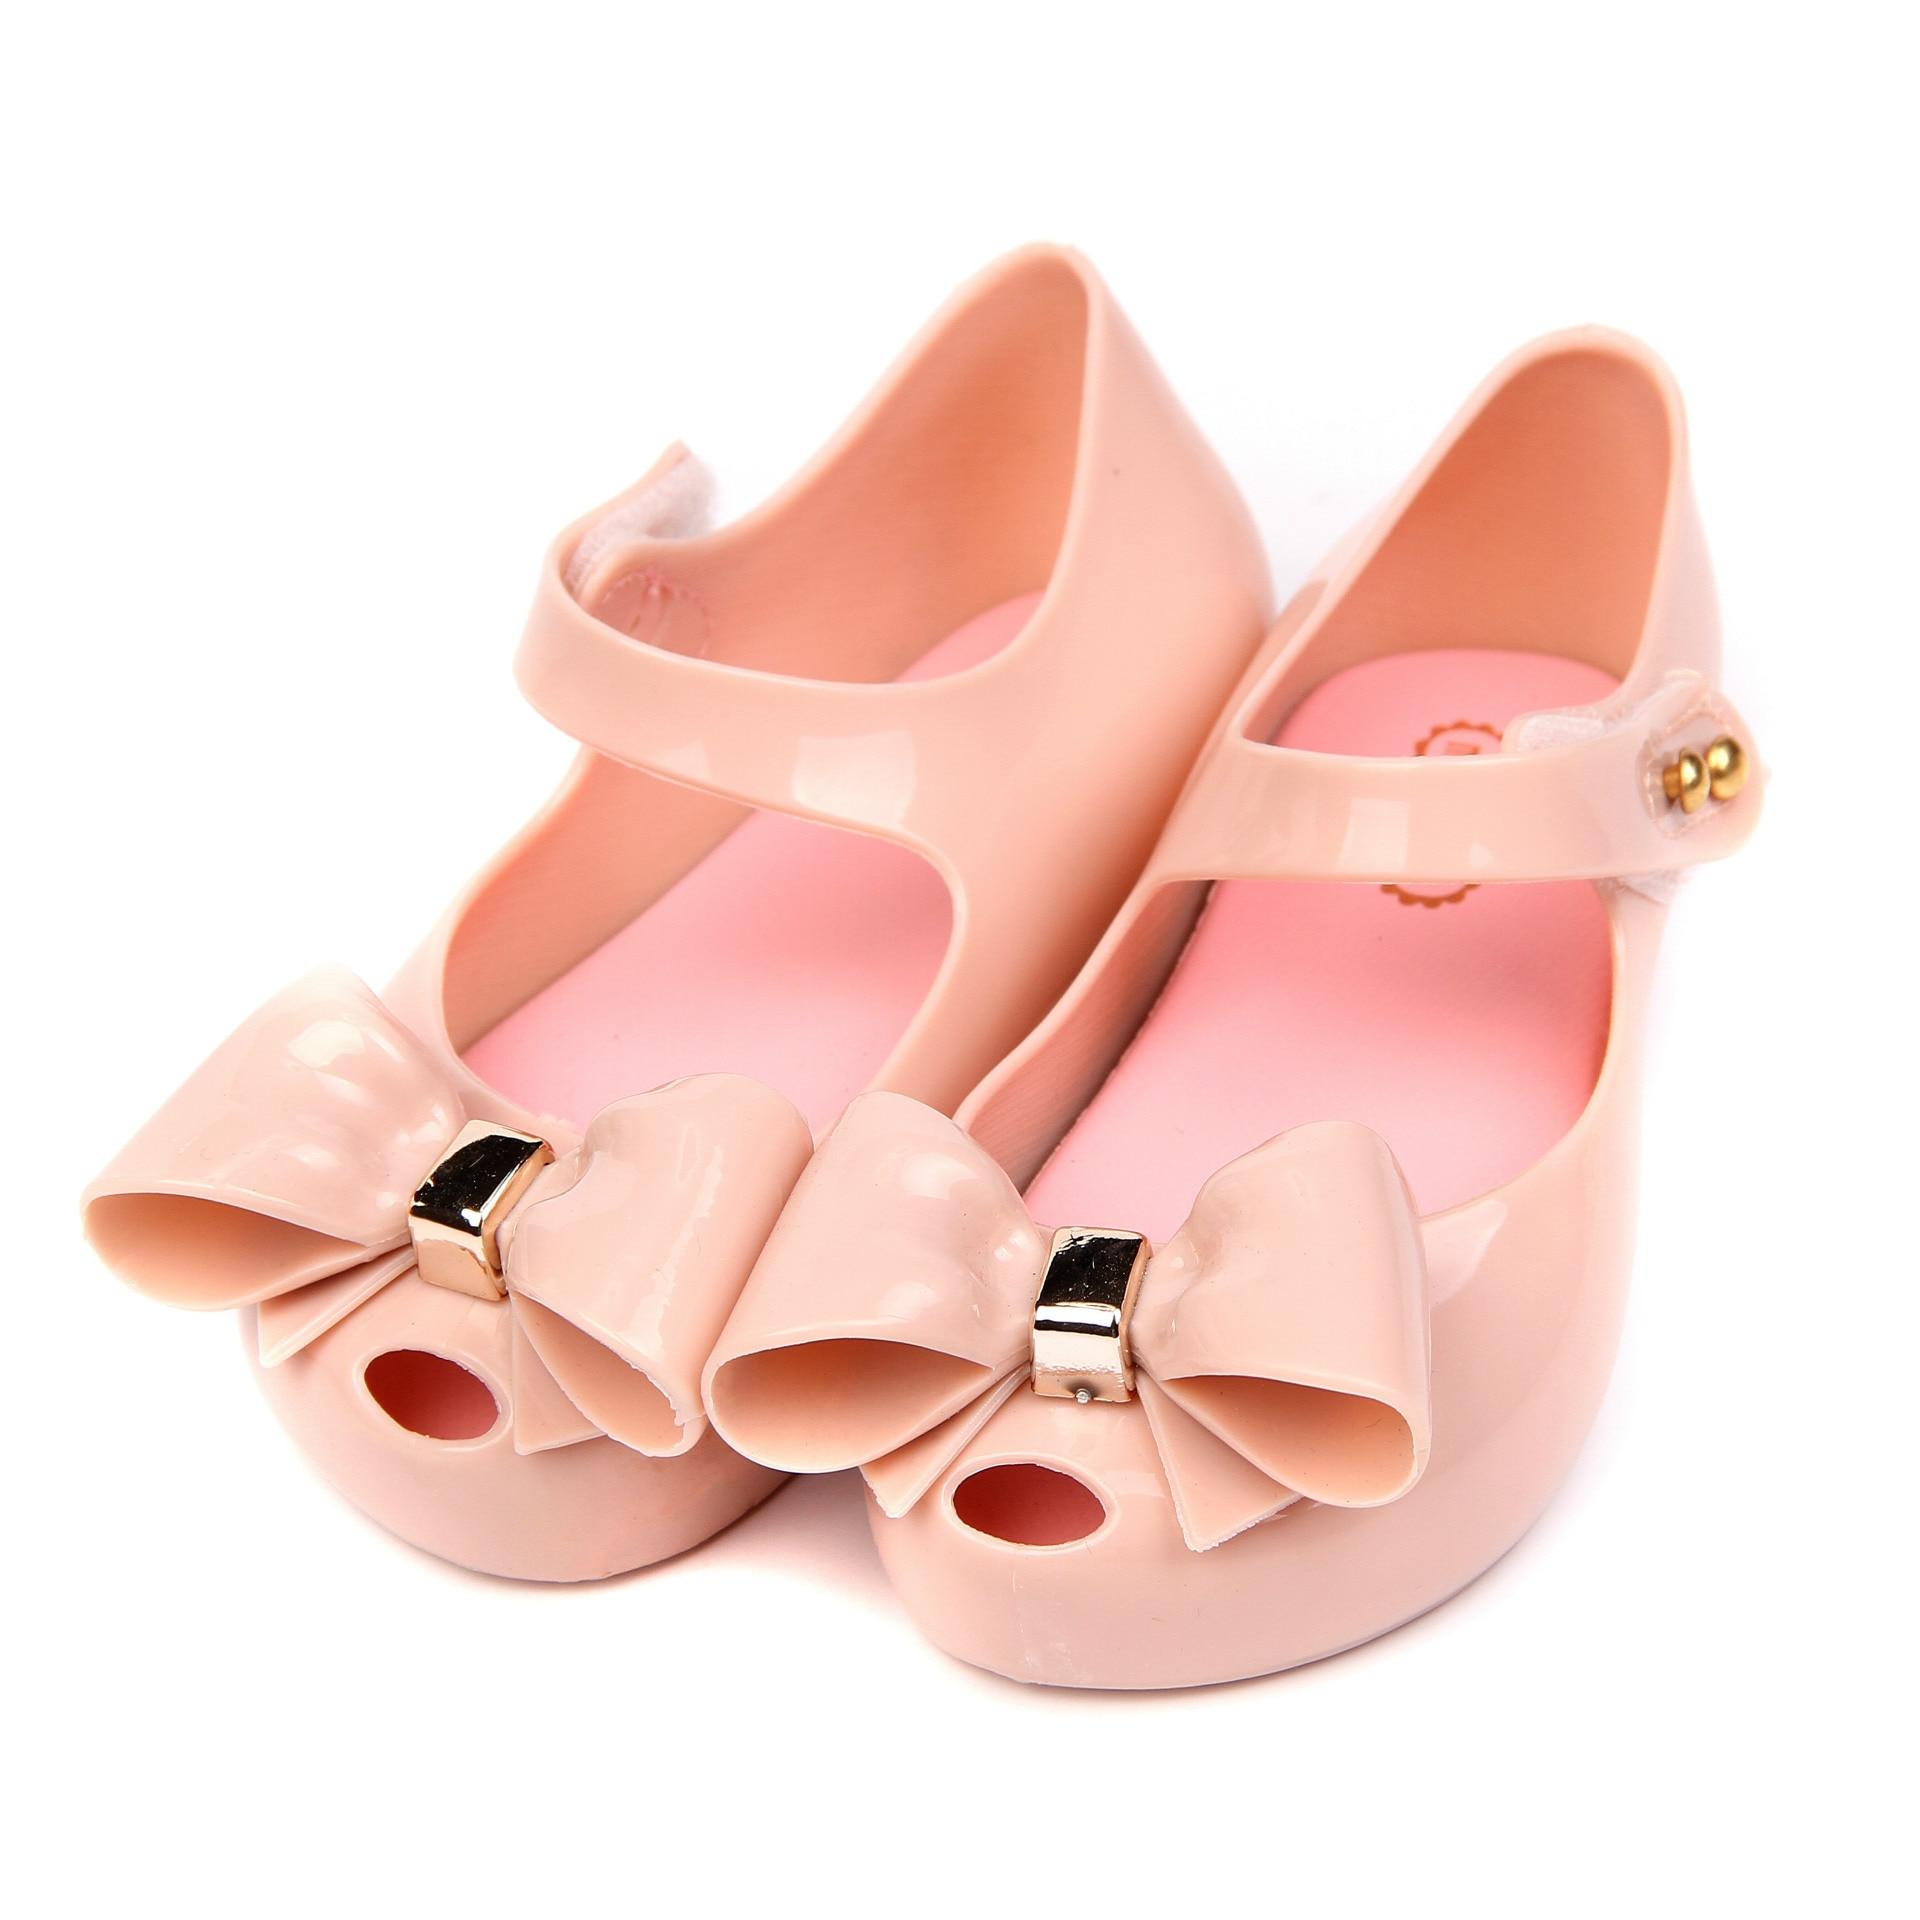 44fcca2e435b3 Mini Melissa 2017 Winter New PVC Bow Soft Comfort Kids Sandal Winter Shoe  Toddler Girl Sandals Jelly Shoes